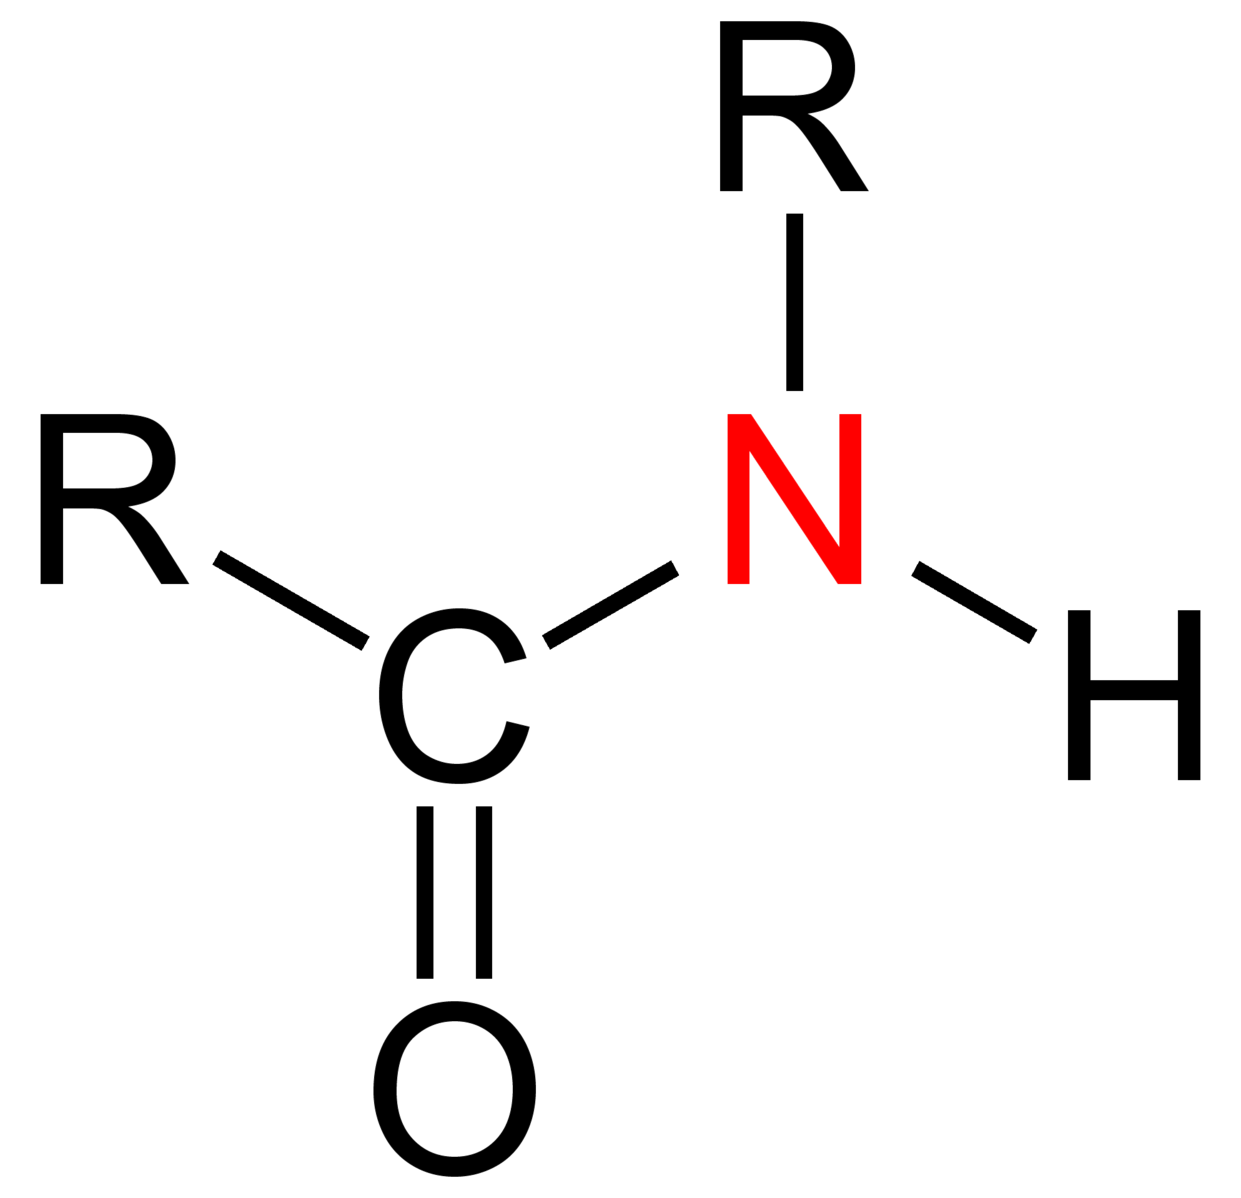 formulae Ipa(key): /ˈfɔː(ɹ)mjəˌli/, /ˈfɔː(ɹ)mjəˌleɪ/, /ˈfɔː(ɹ)mjəˌlaɪ/ formulae plural form of formula fumarole fōrmulae nominative plural of fōrmula genitive singular of fōrmula dative singular of fōrmula vocative plural of fōrmula.